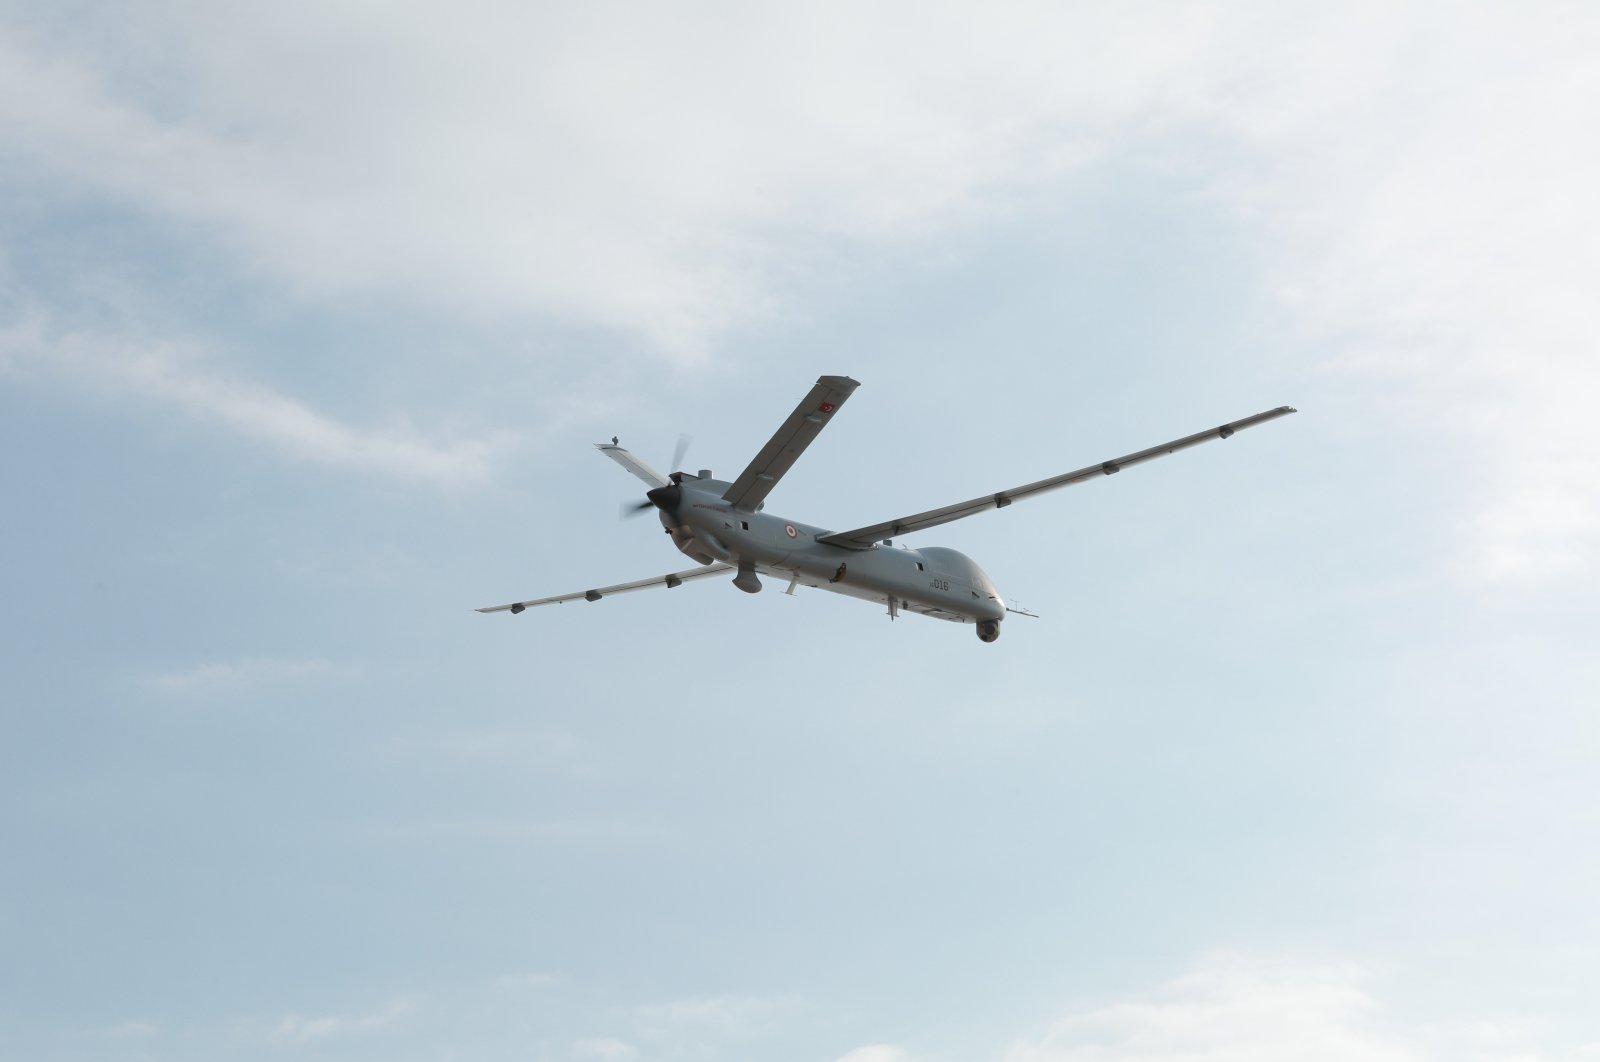 TAI's Anka seen in air in this photo provided on Aug. 14, 2021. (IHA Photo)